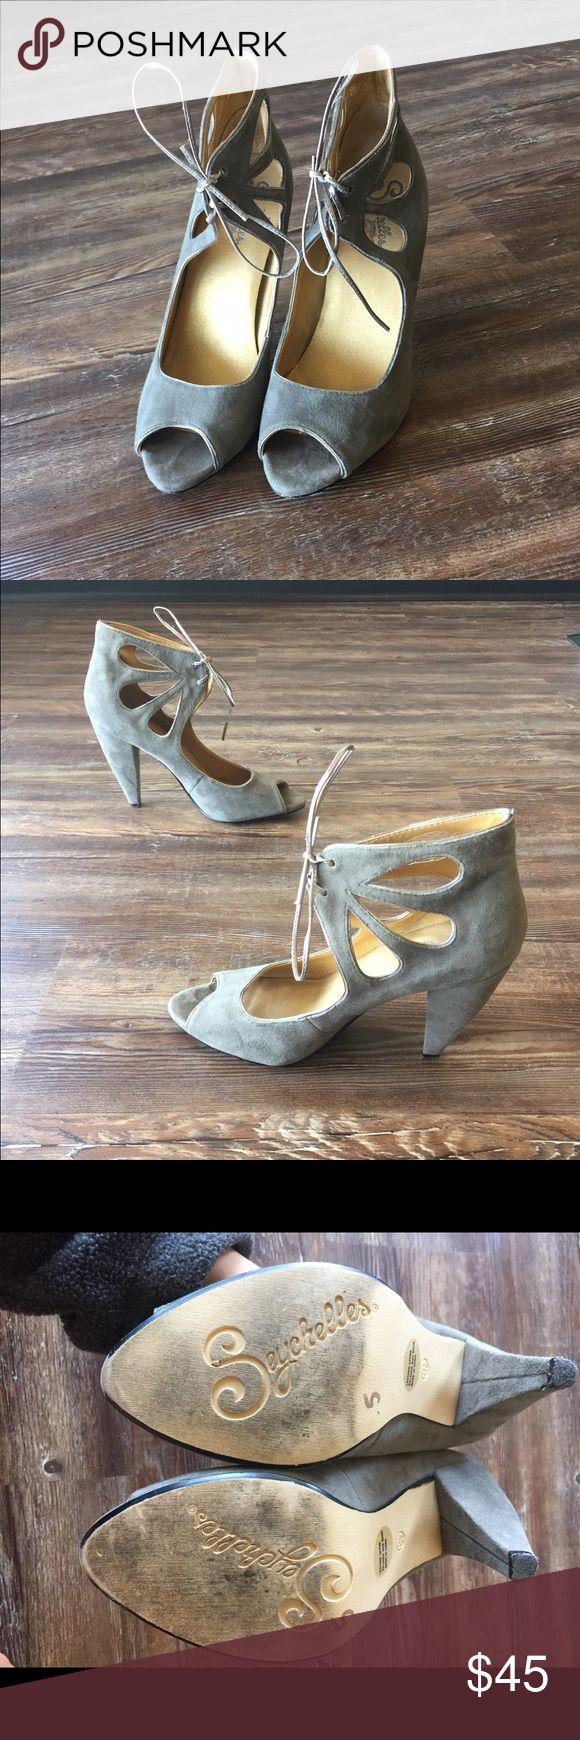 Seychelles Women's Heels- Peep Toe- sz 8 1/2 Seychelles Women's Heels- Peep Toe- sz 8 1/2 Seychelles Shoes Heels